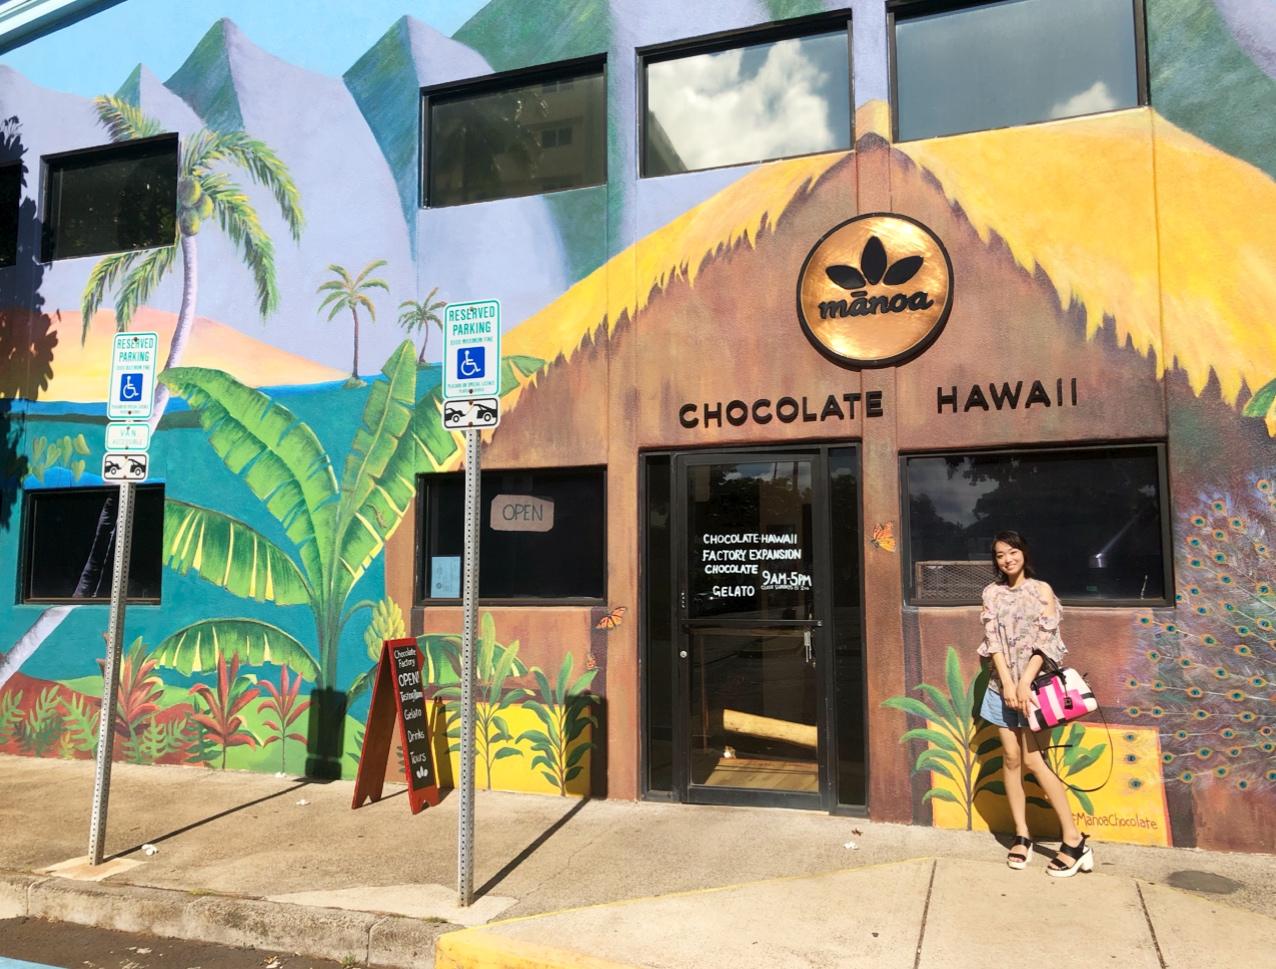 《HAWAII》ハワイのブランドチョコレート❁チョコレート工房見学( ´ ▽ ` )色んなチョコのテイスティングも♩_10